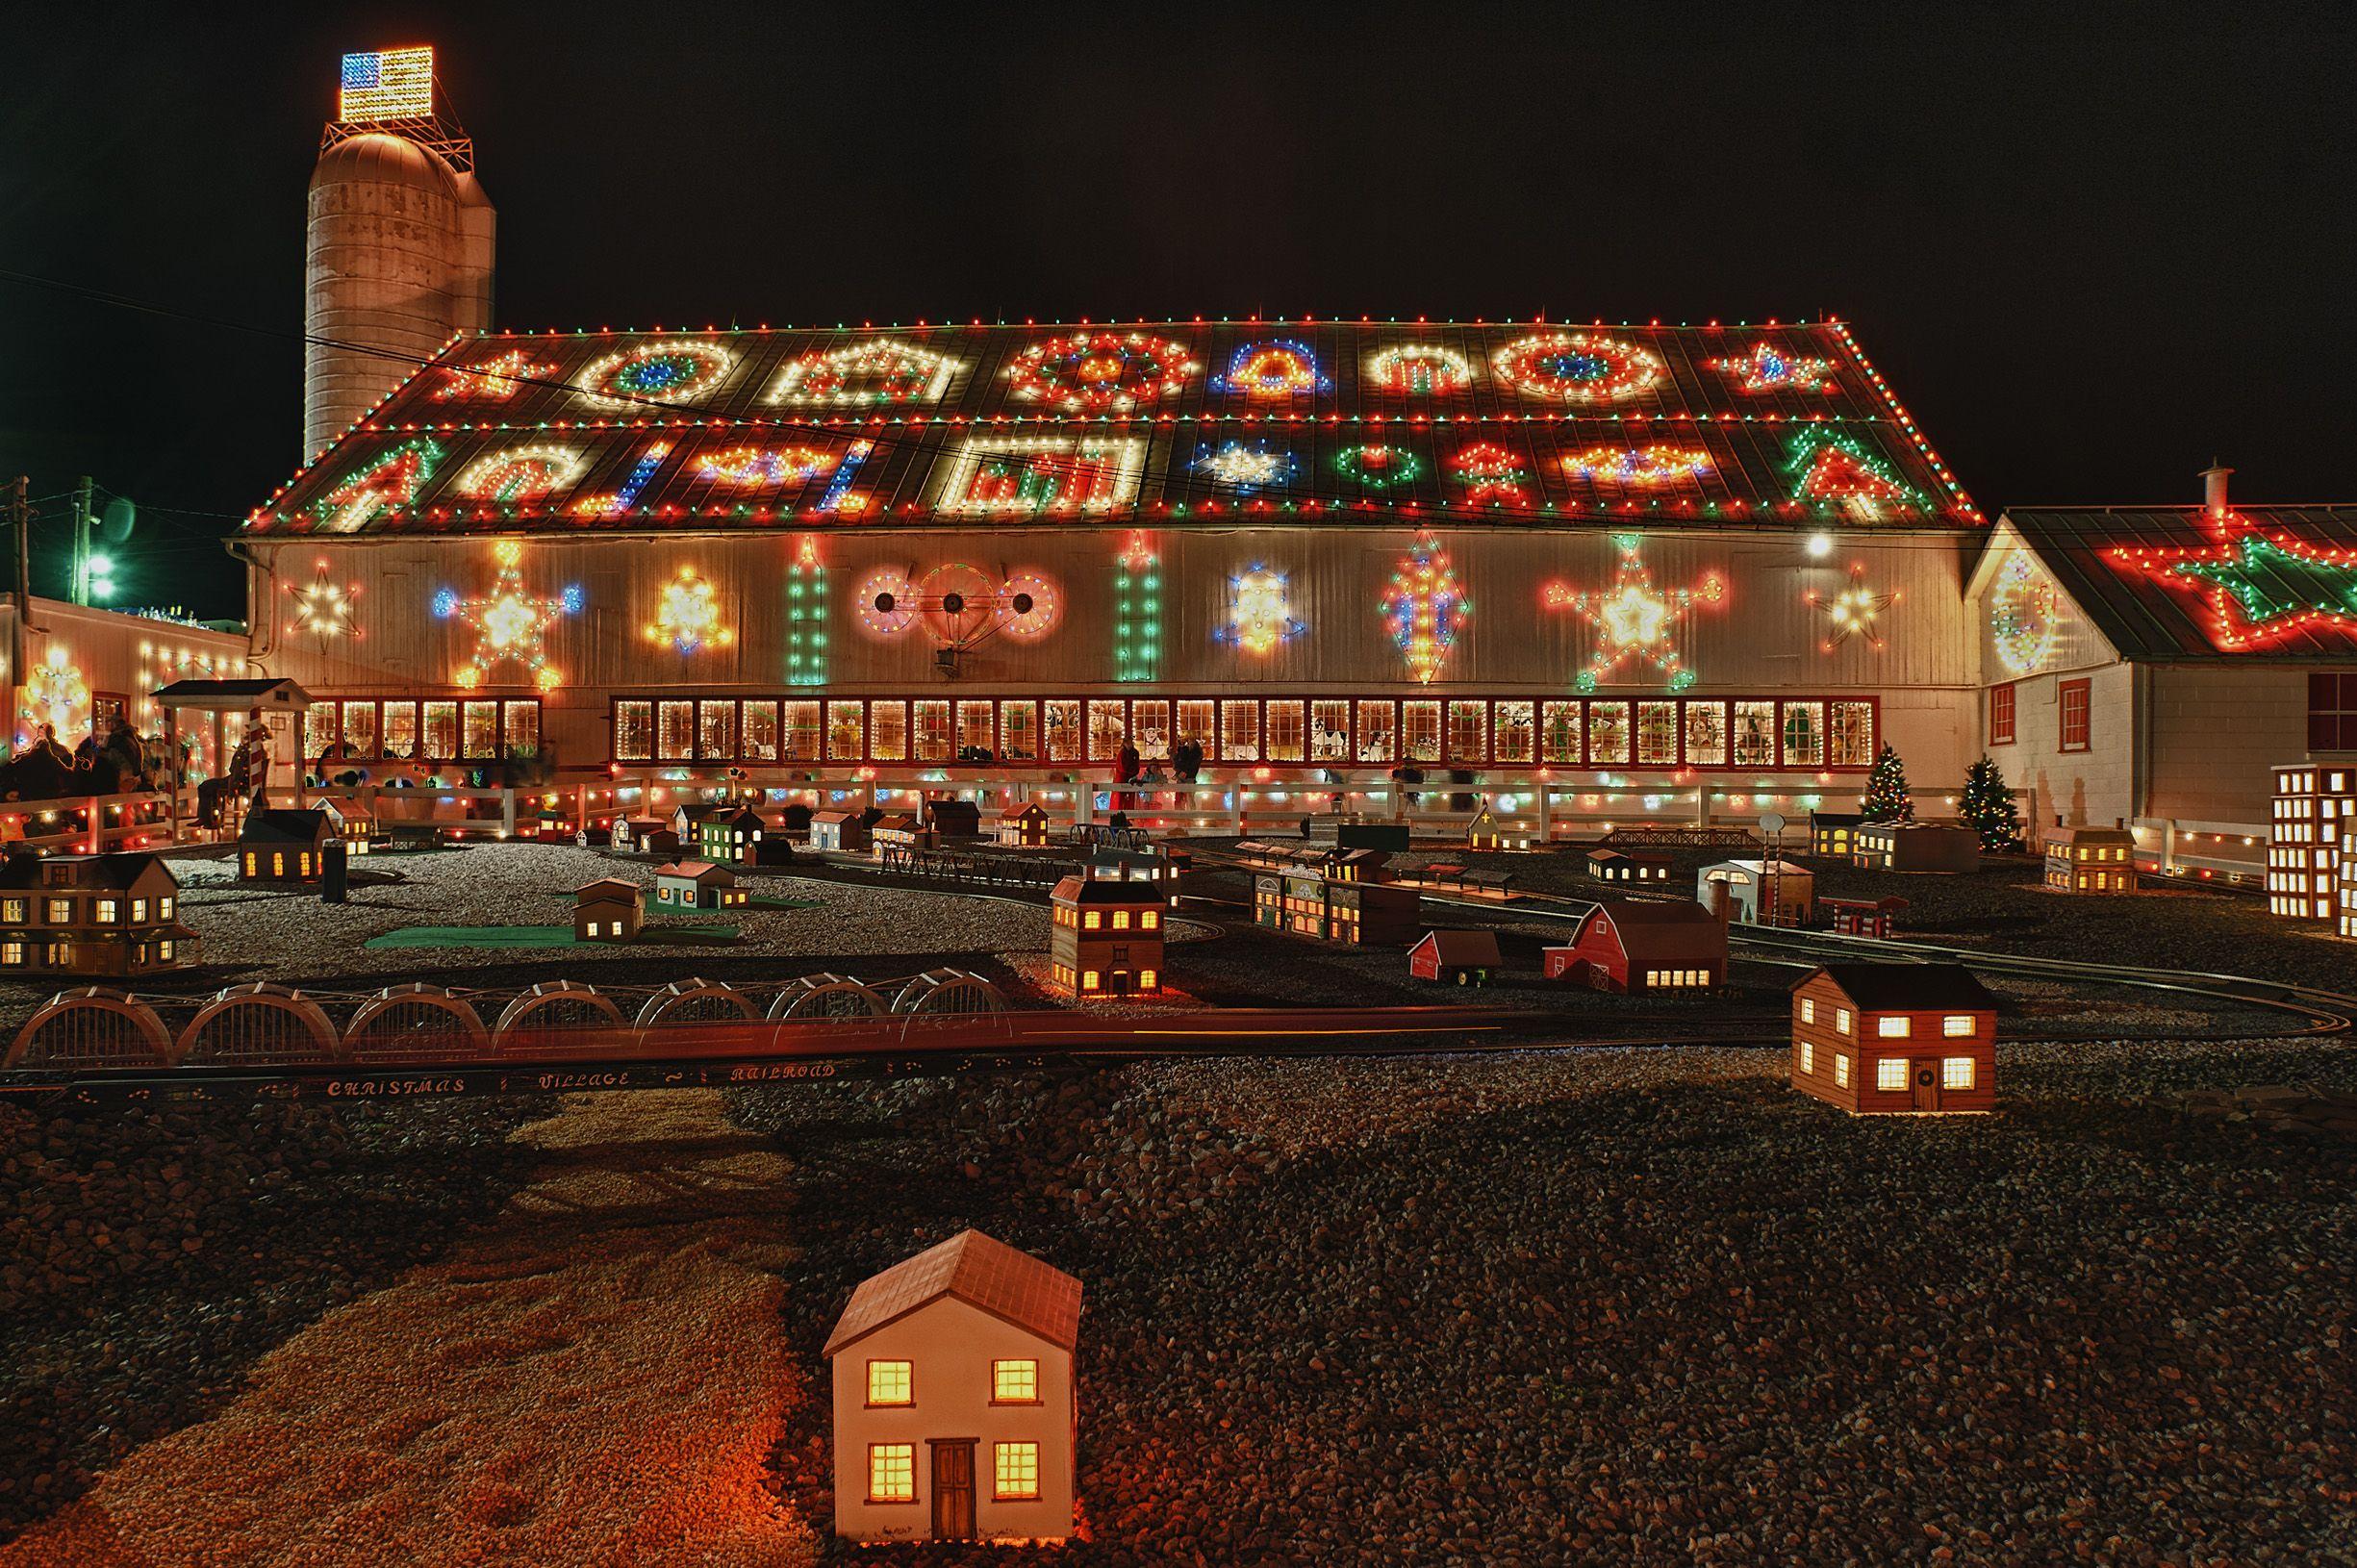 Best Christmas Light Displays Near Me Mn 2021 38 Best Christmas Light Displays In The U S Holiday Light Shows Near Me